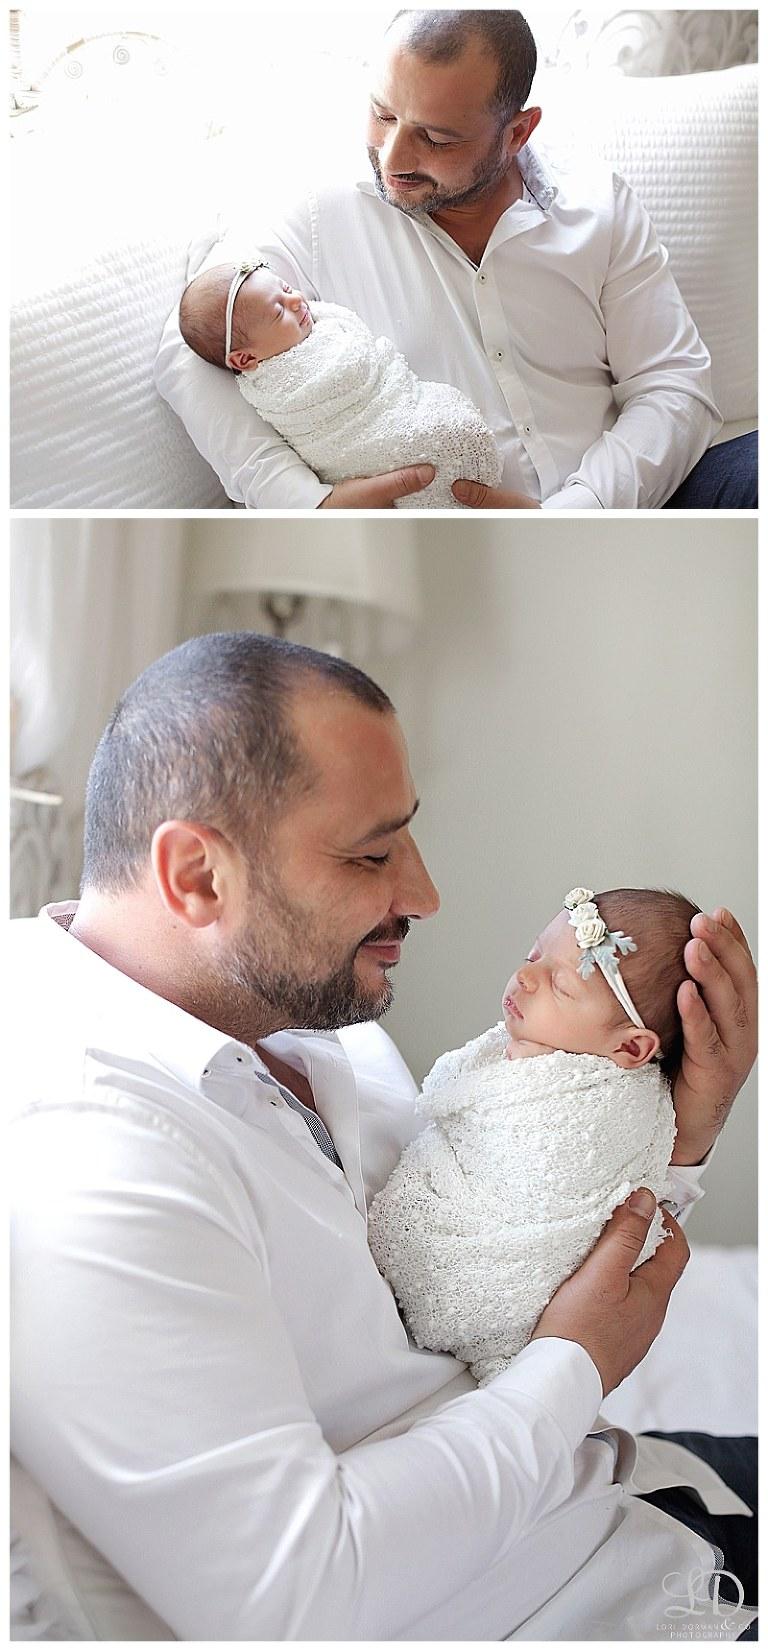 sweet maternity photoshoot-lori dorman photography-maternity boudoir-professional photographer_5079.jpg